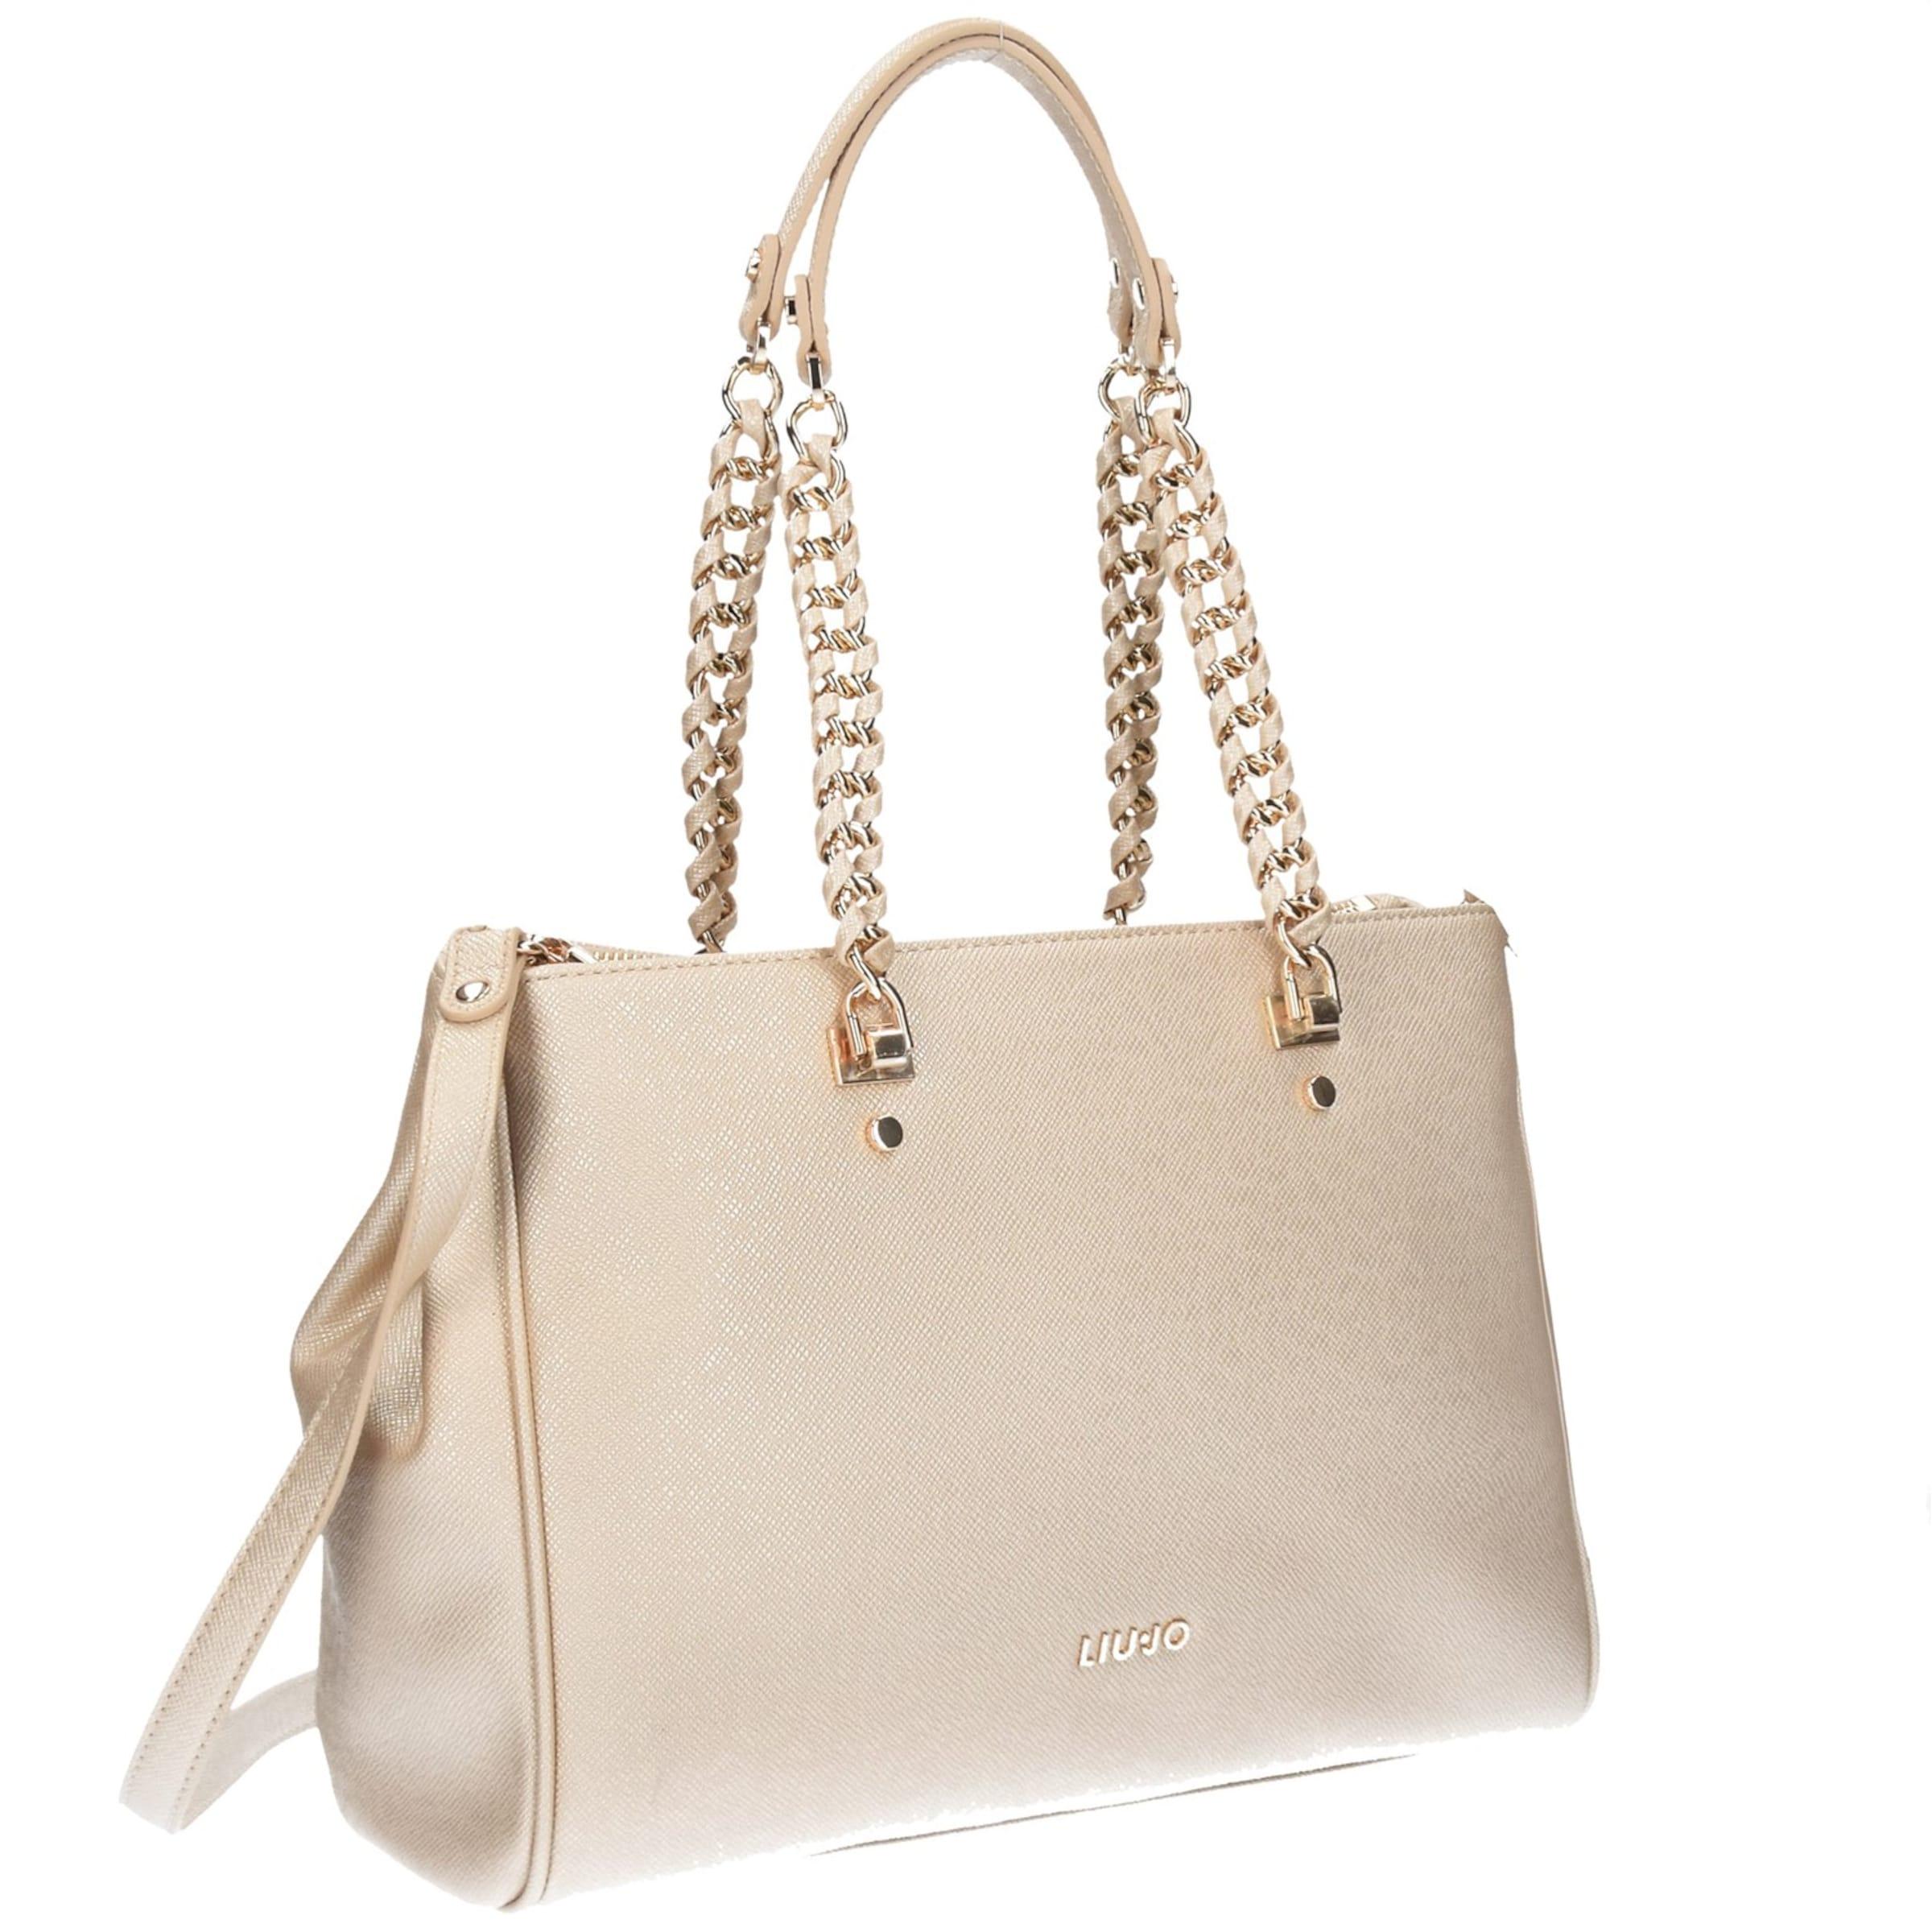 Große Überraschung Online Liu Jo Shopping Anna Shopper Tasche 34 cm Auslasszwischenraum Rabatt Extrem Frei Verschiffen Angebot Günstig Kaufen Nicekicks ZT7PXa